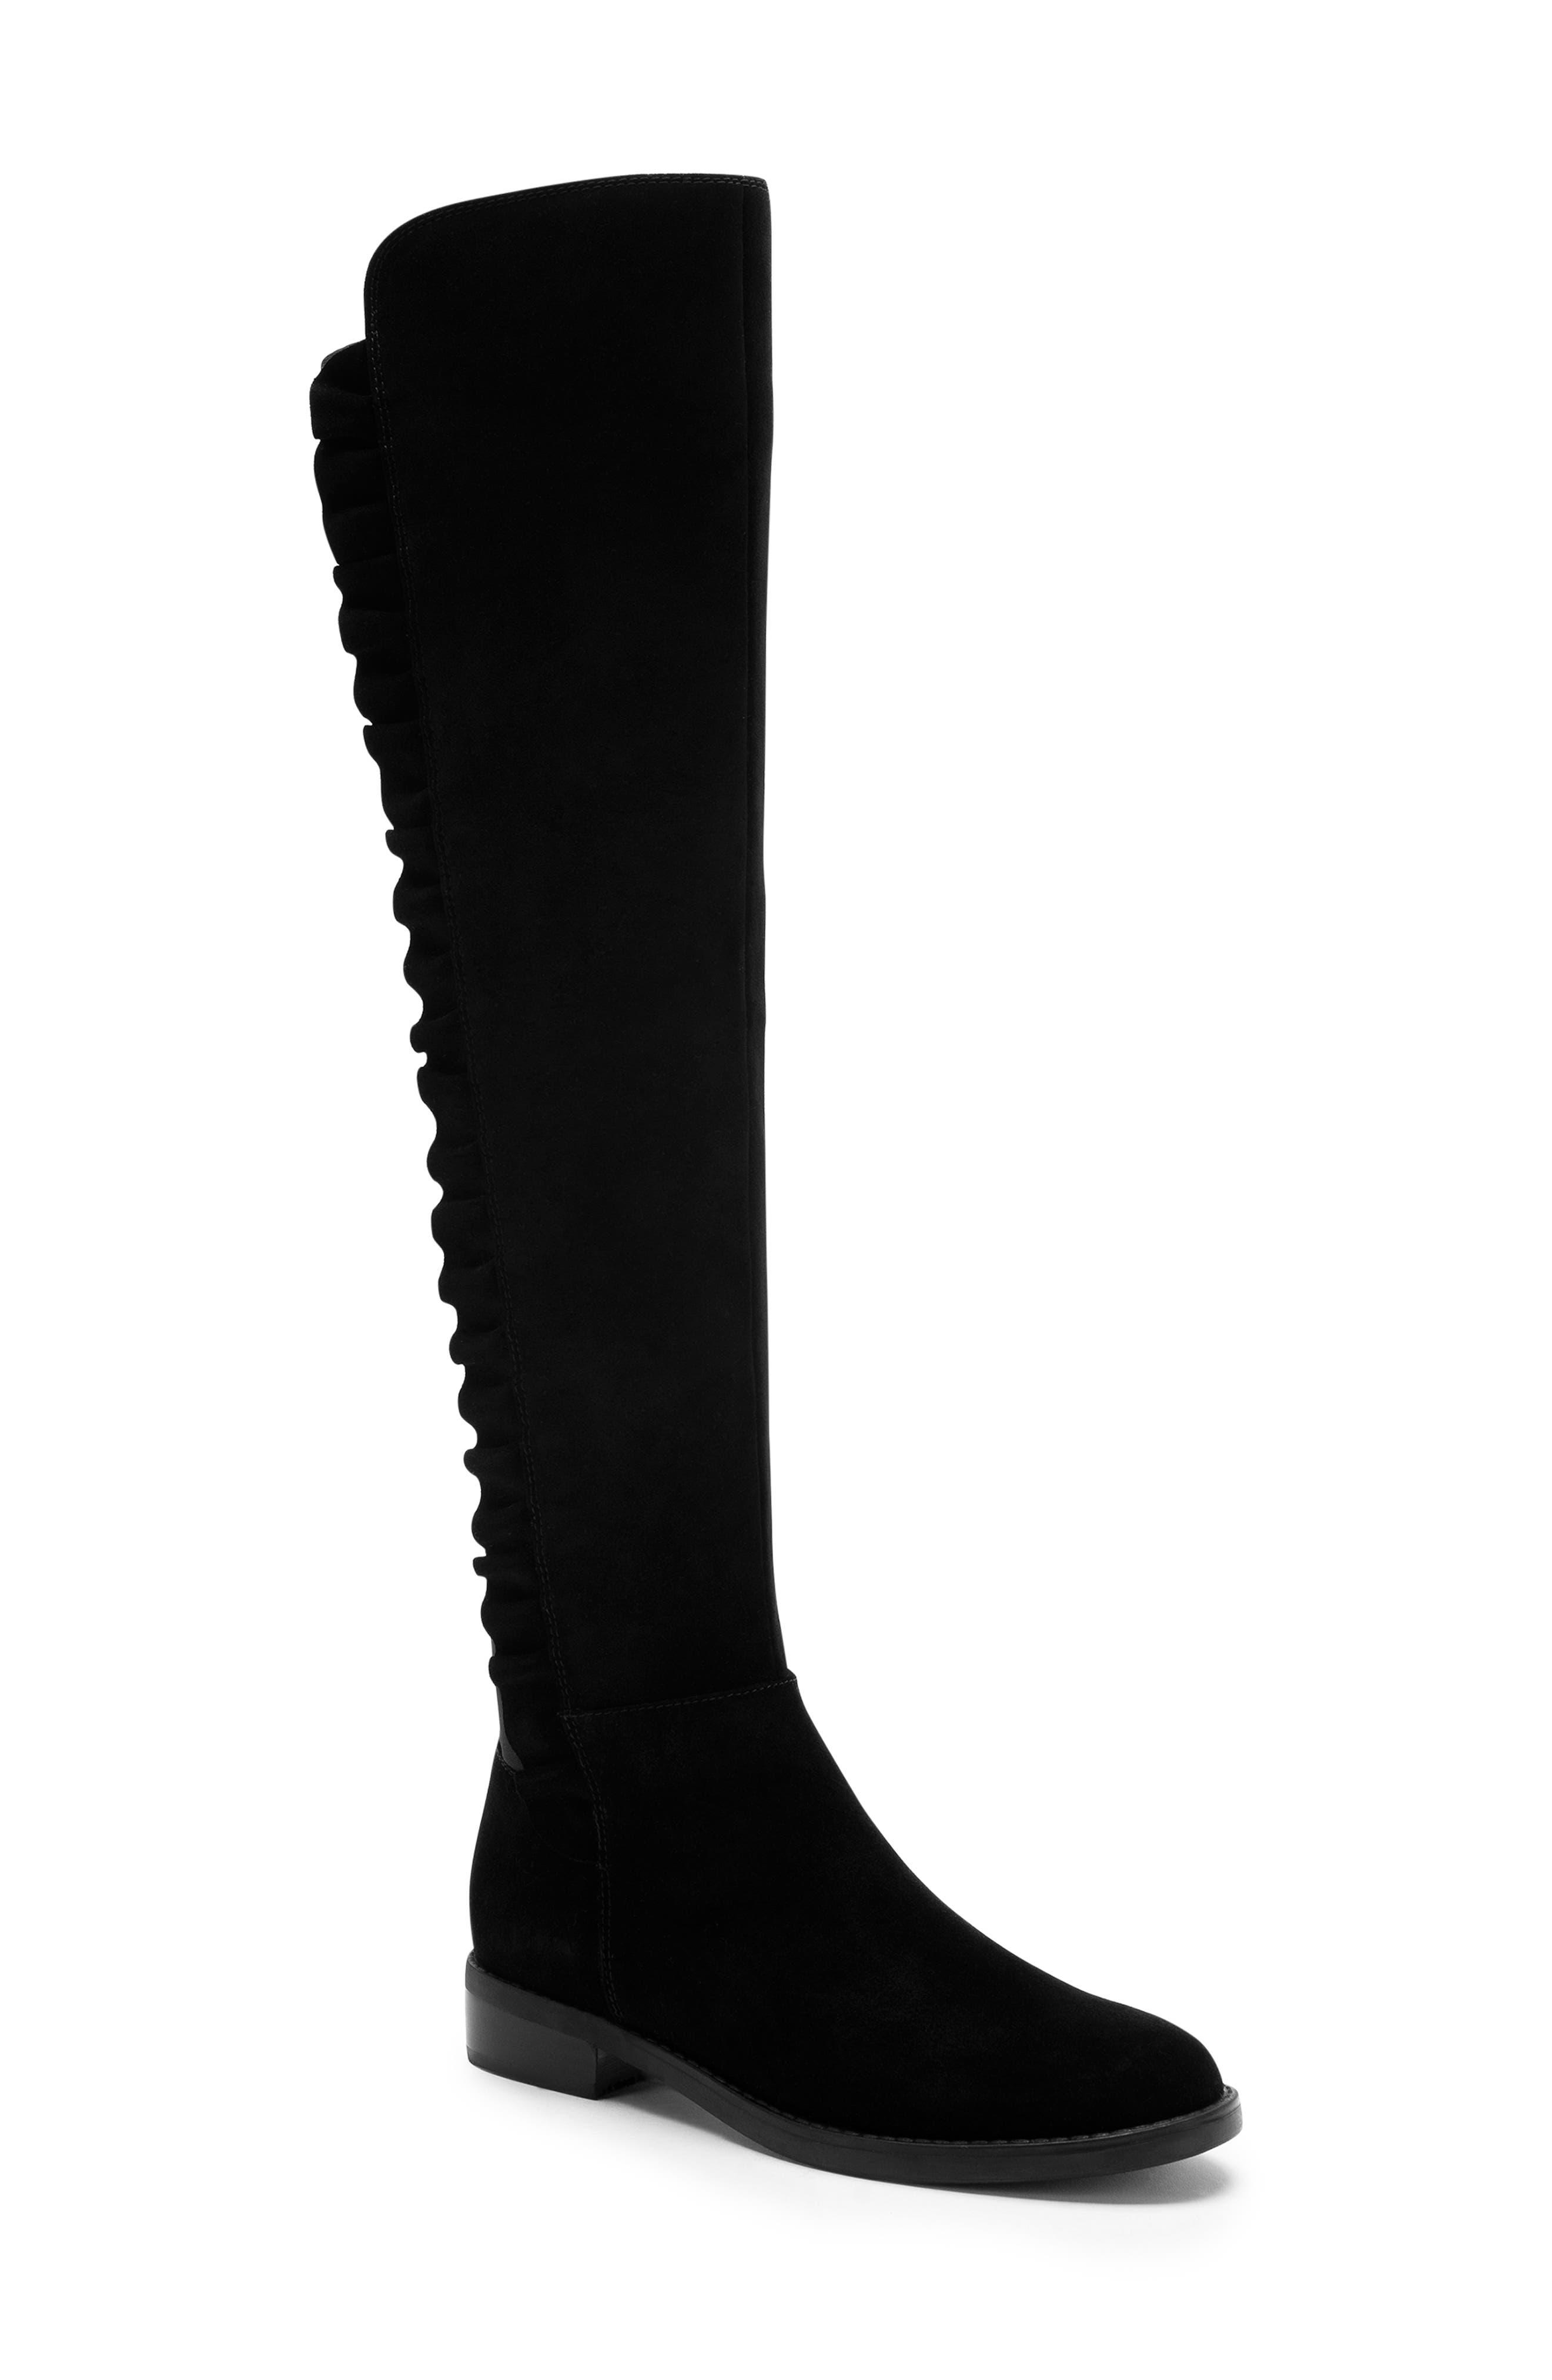 Blondo Ethos Over The Knee Waterproof Stretch Boot, Black